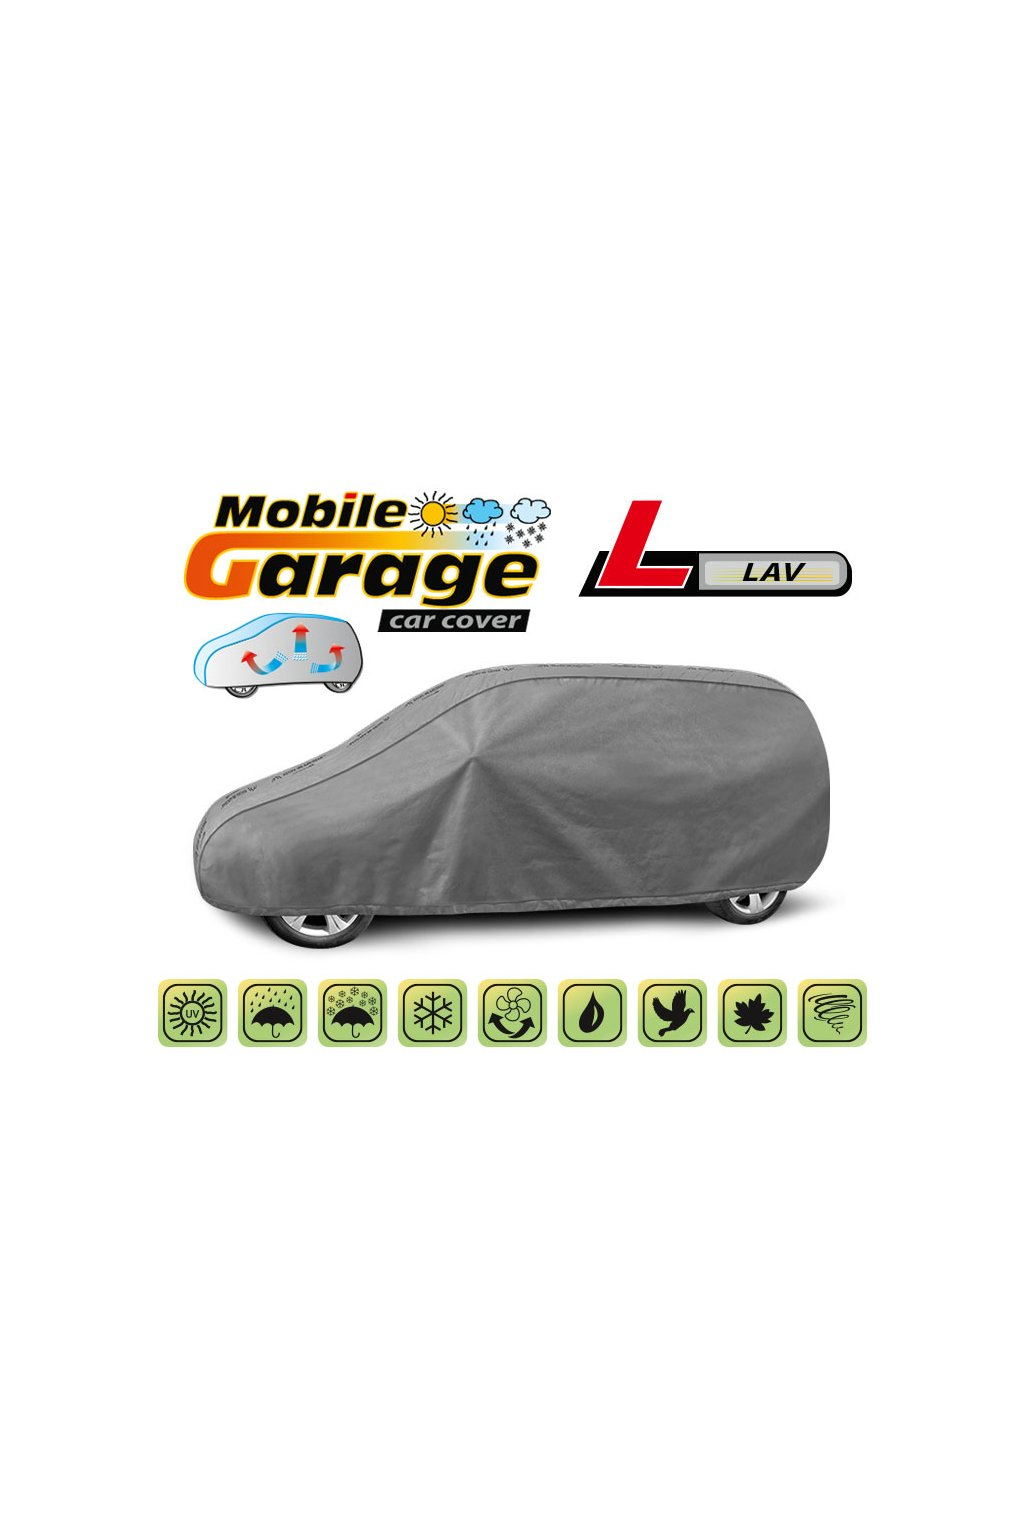 mobile garage L lav 3 art 5 4136 248 3020